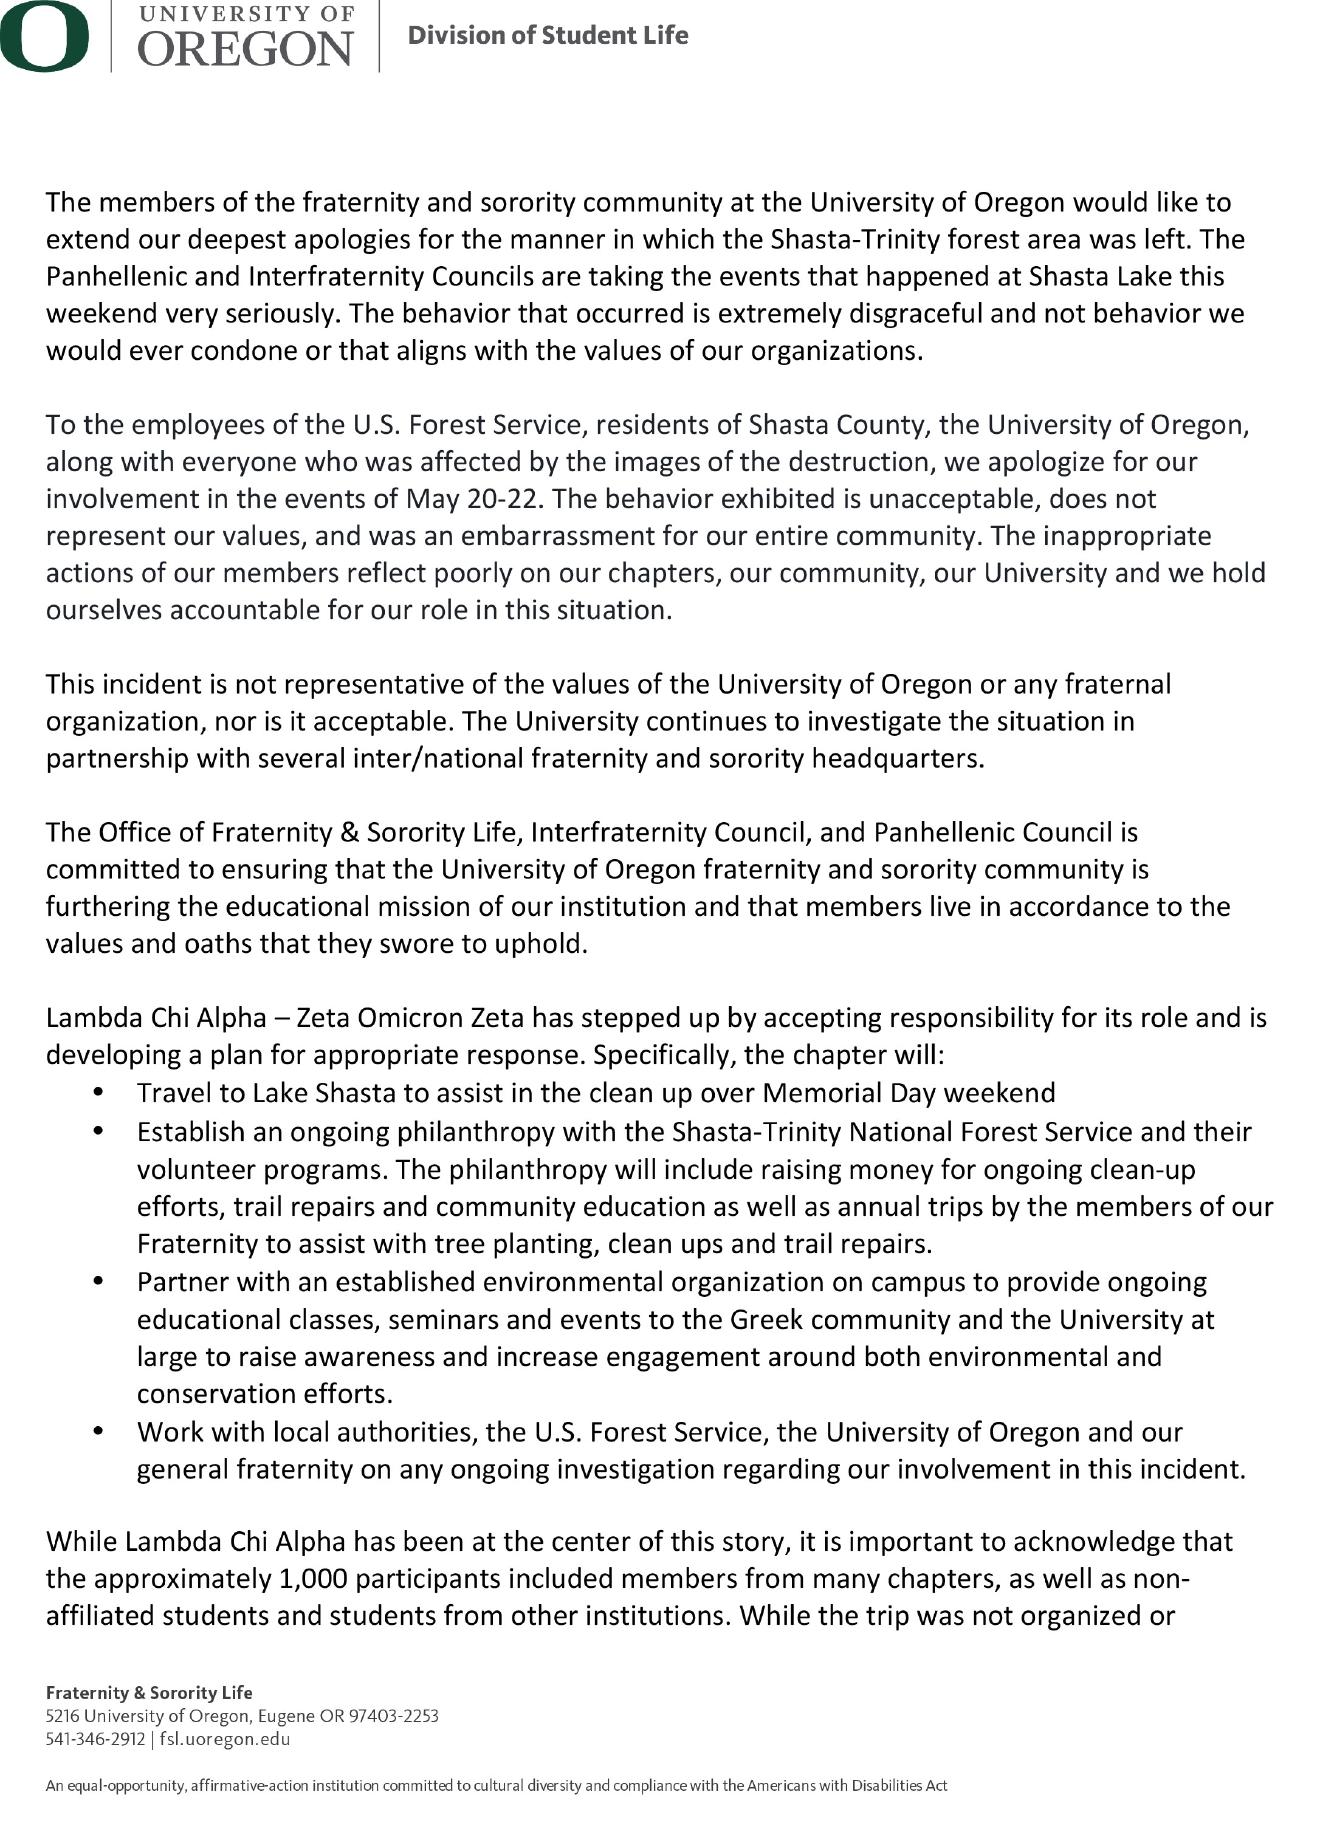 University of Oregon issues apology letter for Lake Shasta trash | KMTR